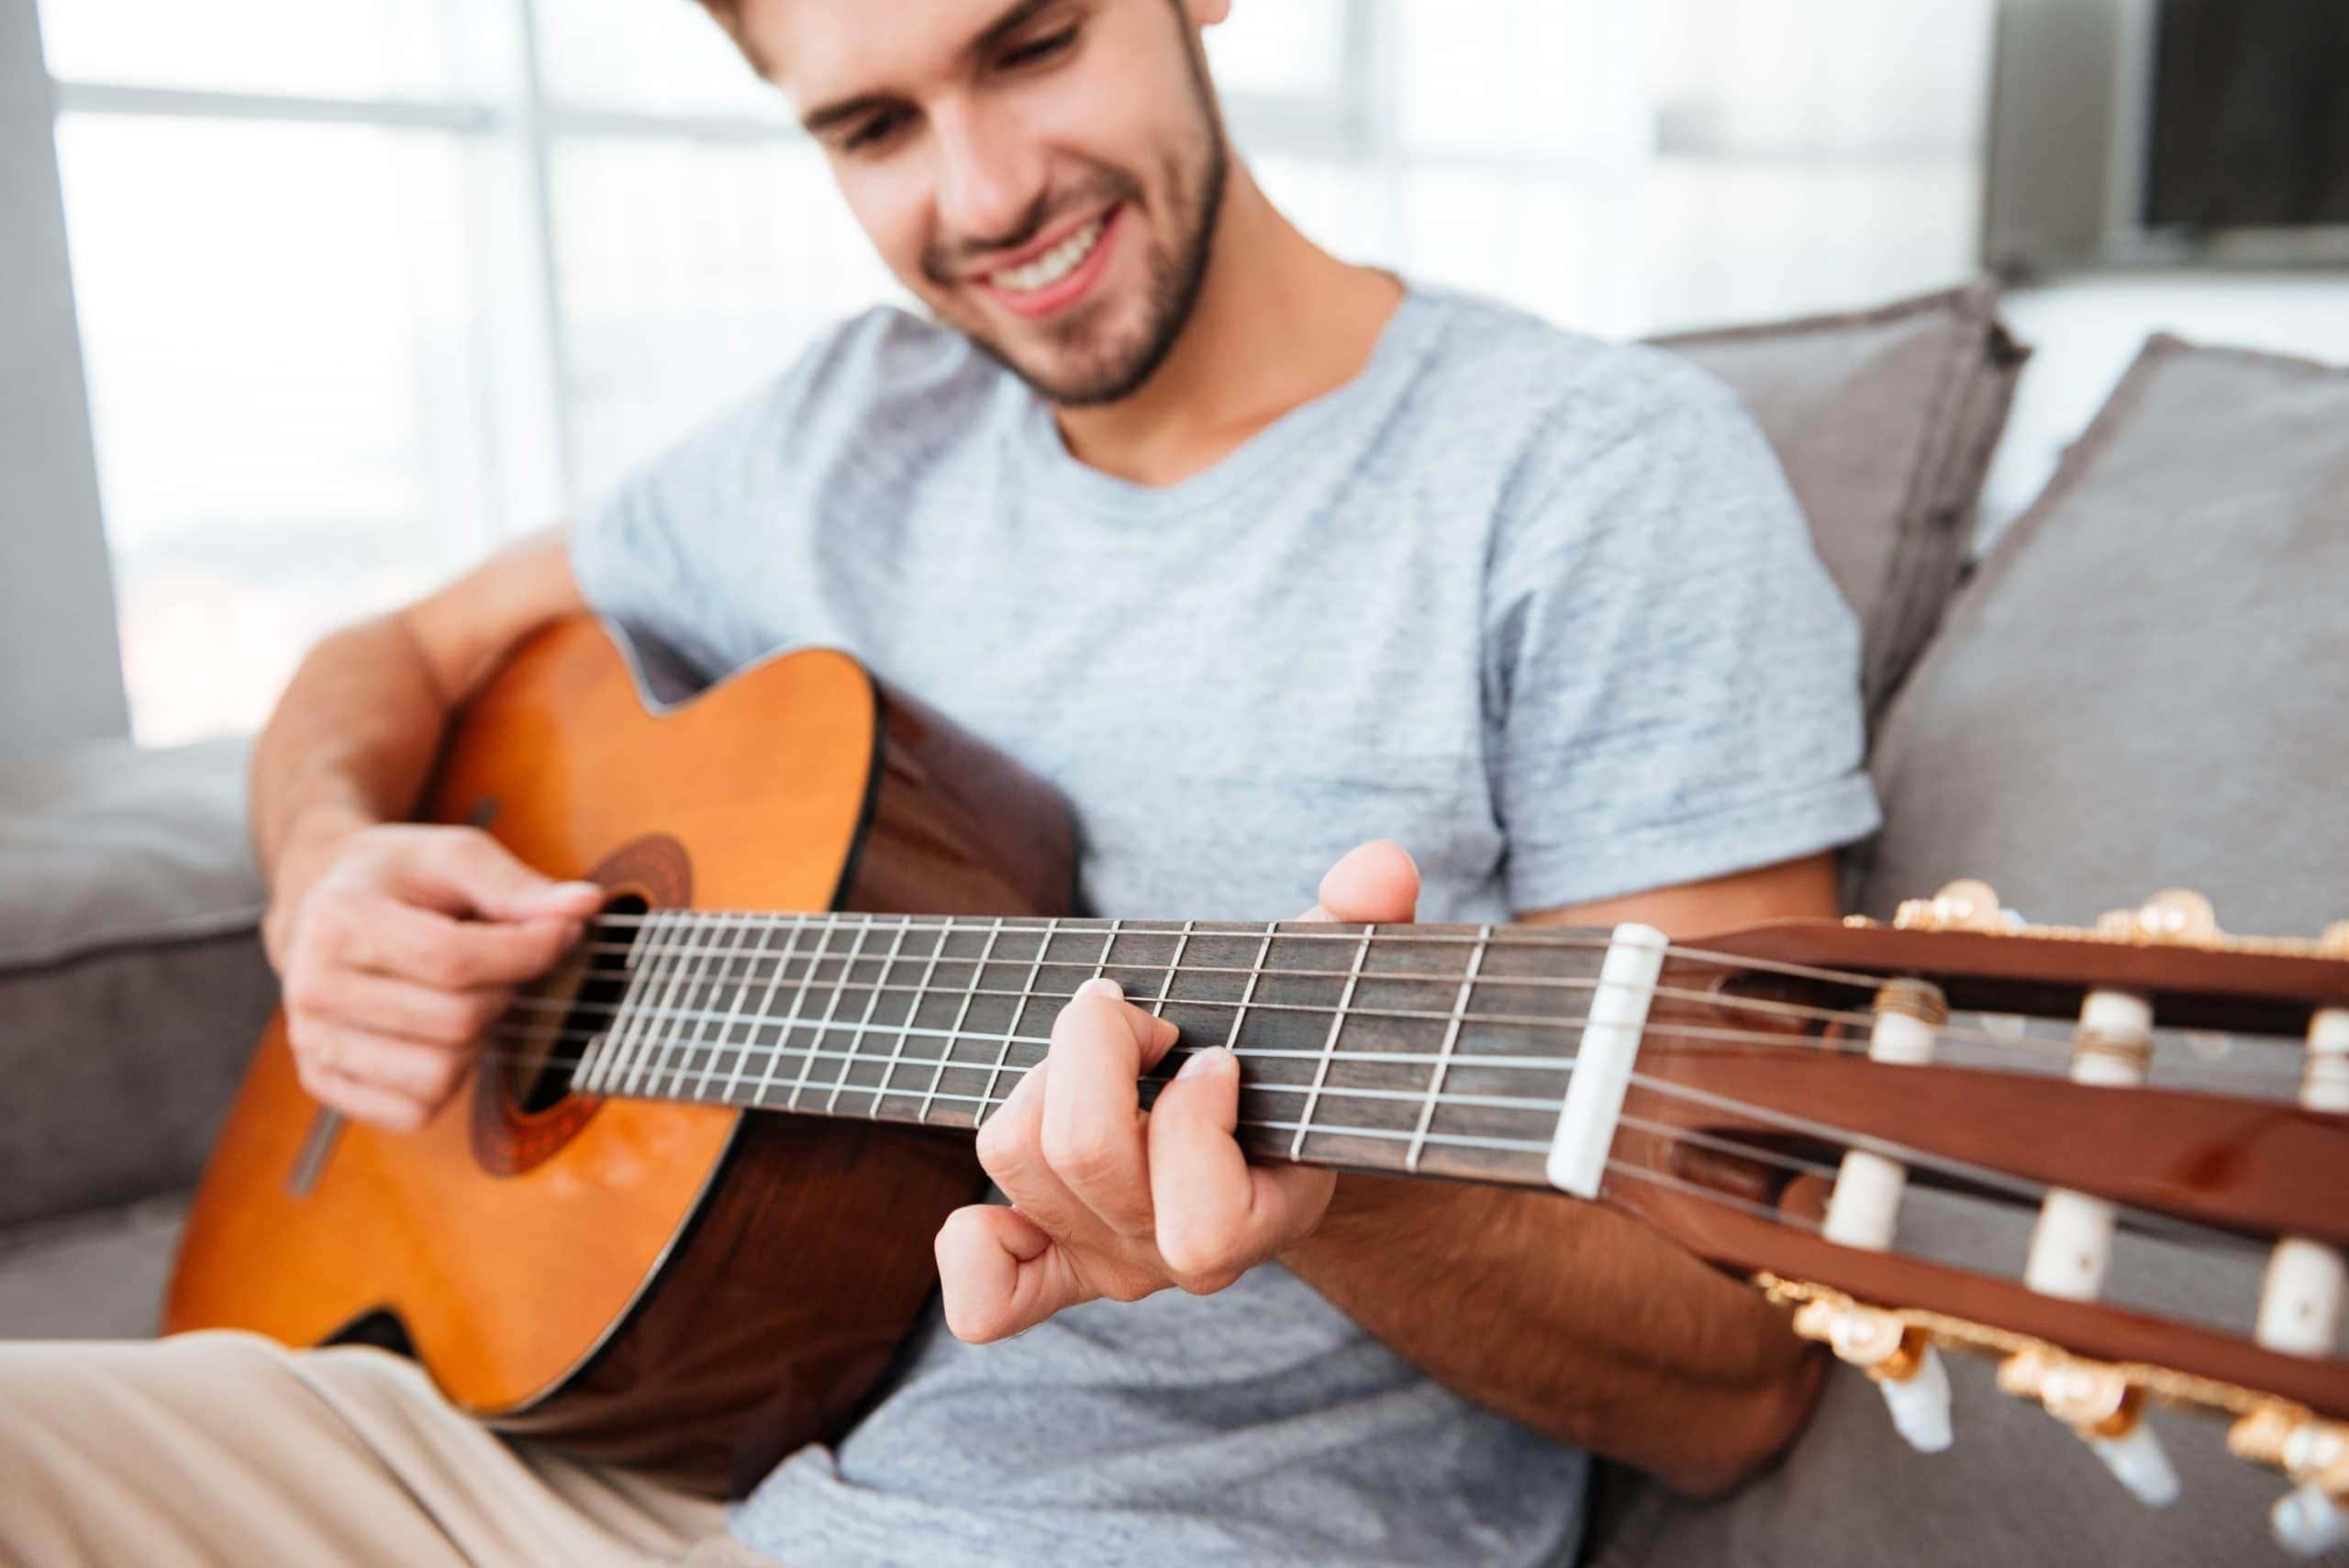 Tocando la guitarra sentado